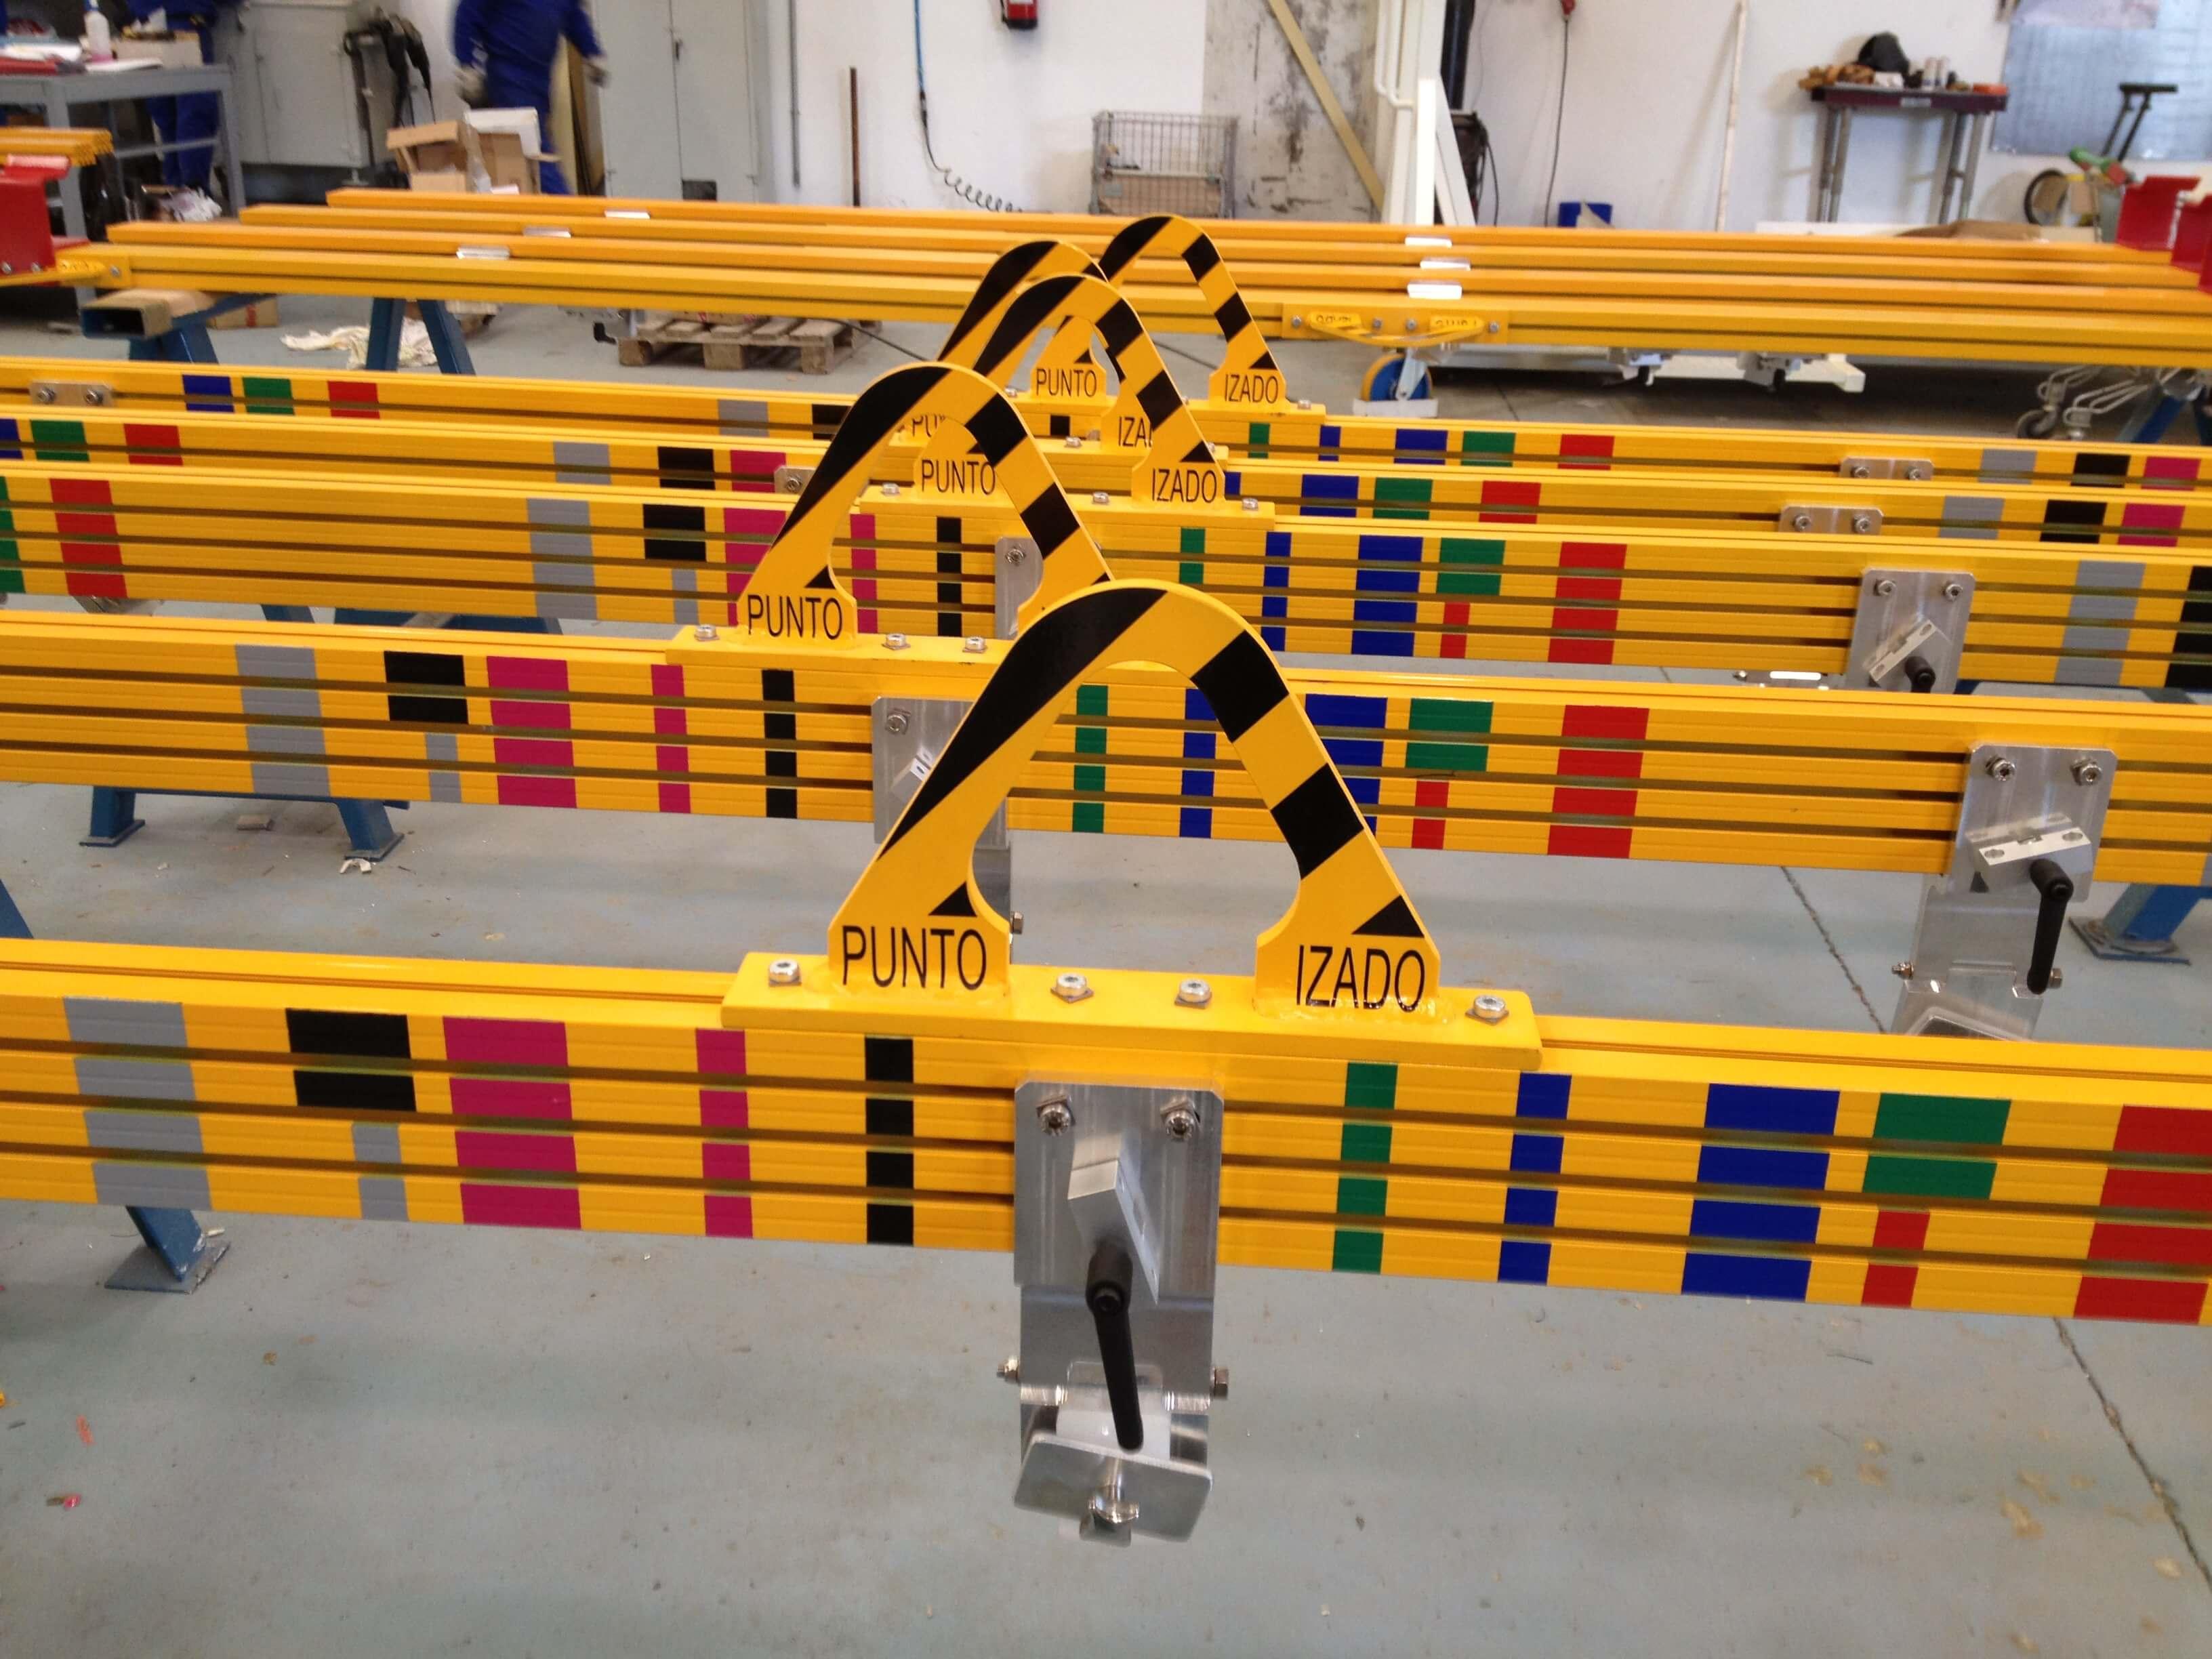 IMG 0205 - Lifting Tools